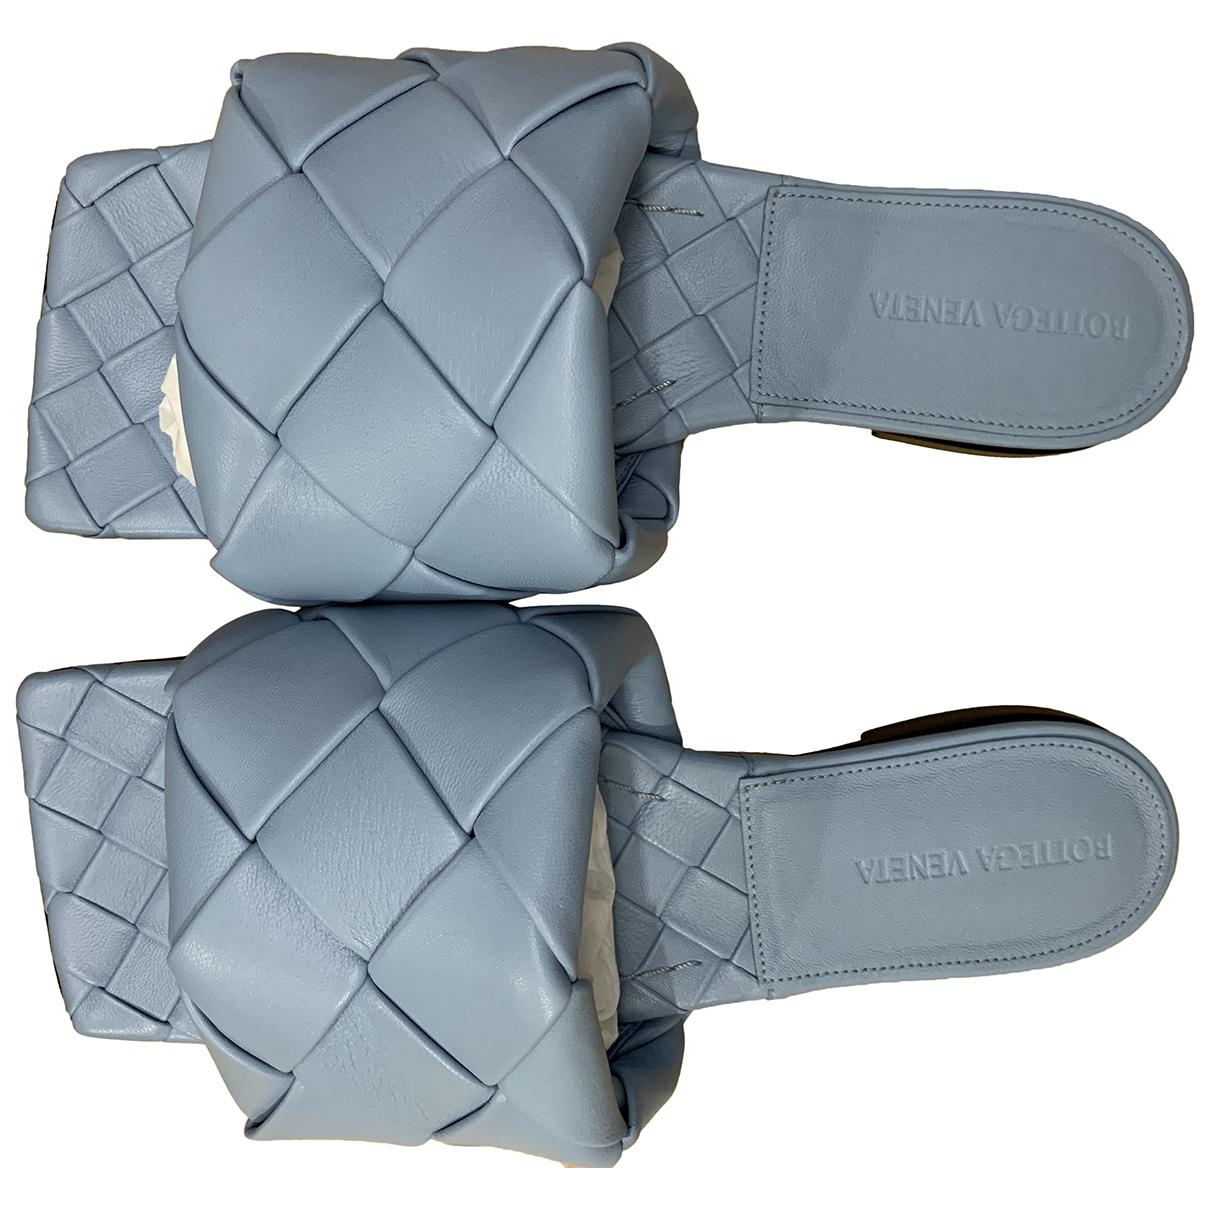 Bottega Veneta - Sandales BV Lido pour femme en cuir - bleu